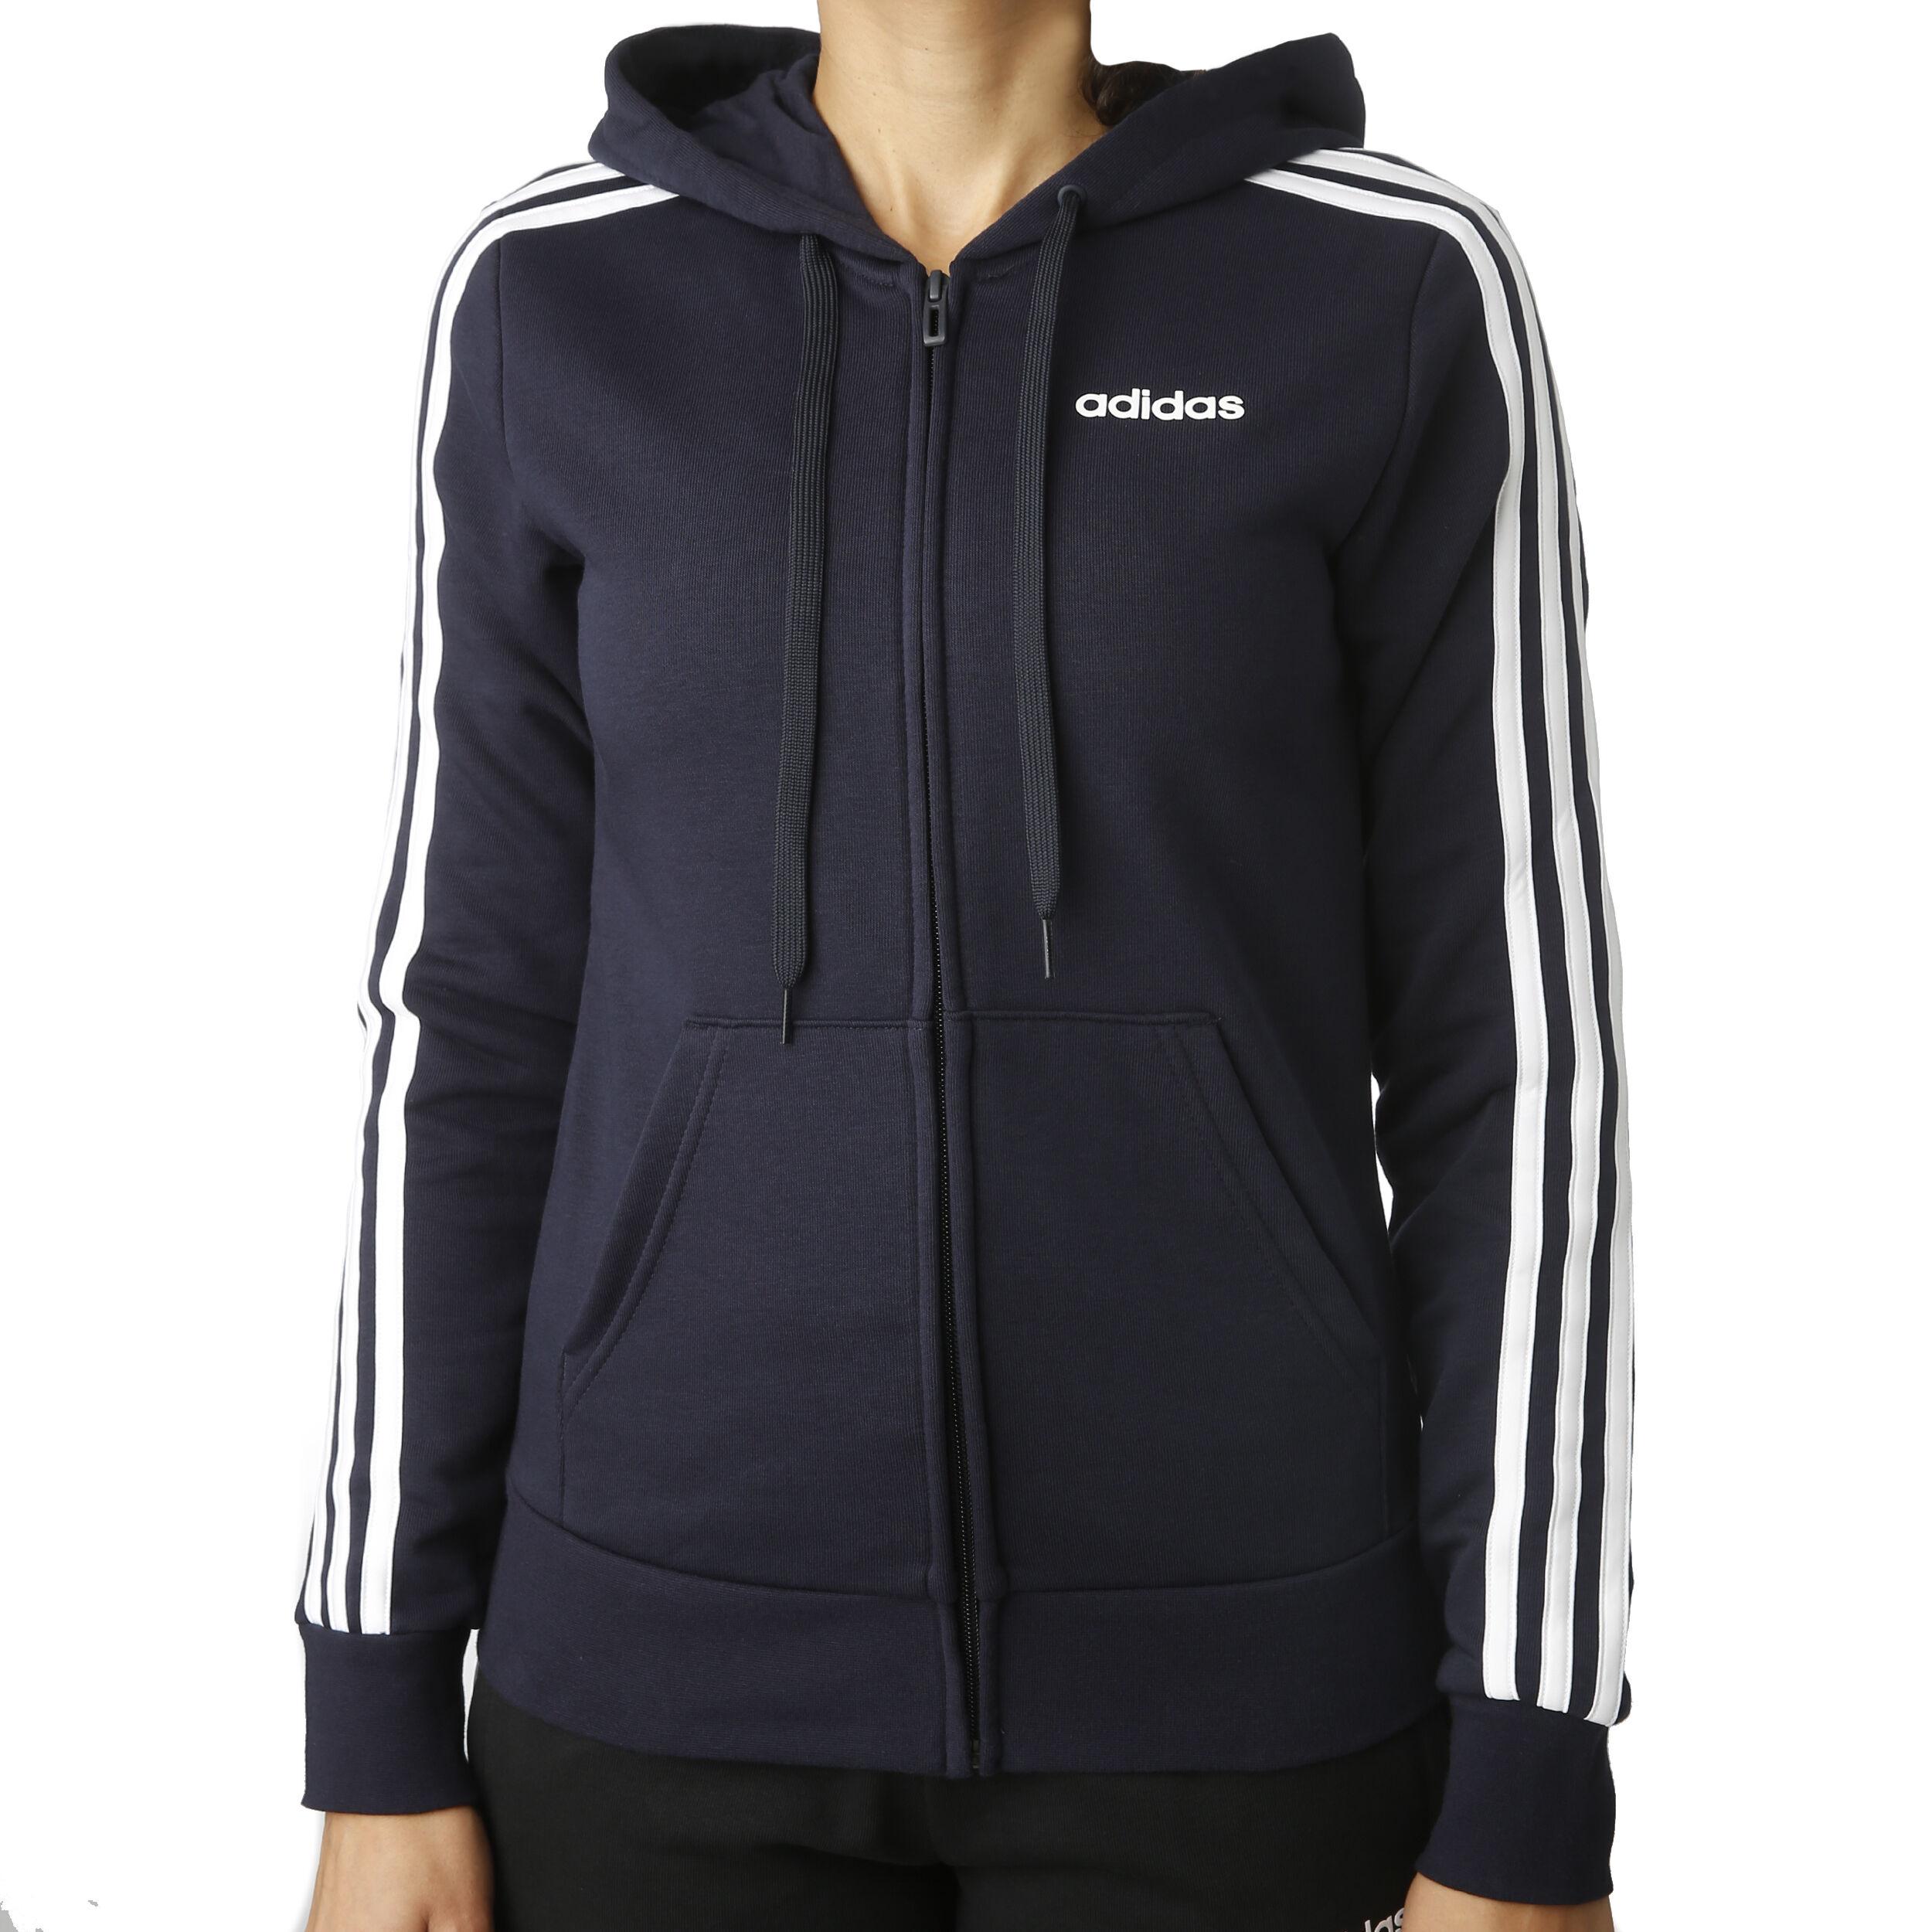 adidas Essentials 3 Stripes Sweatjacke Damen Dunkelblau